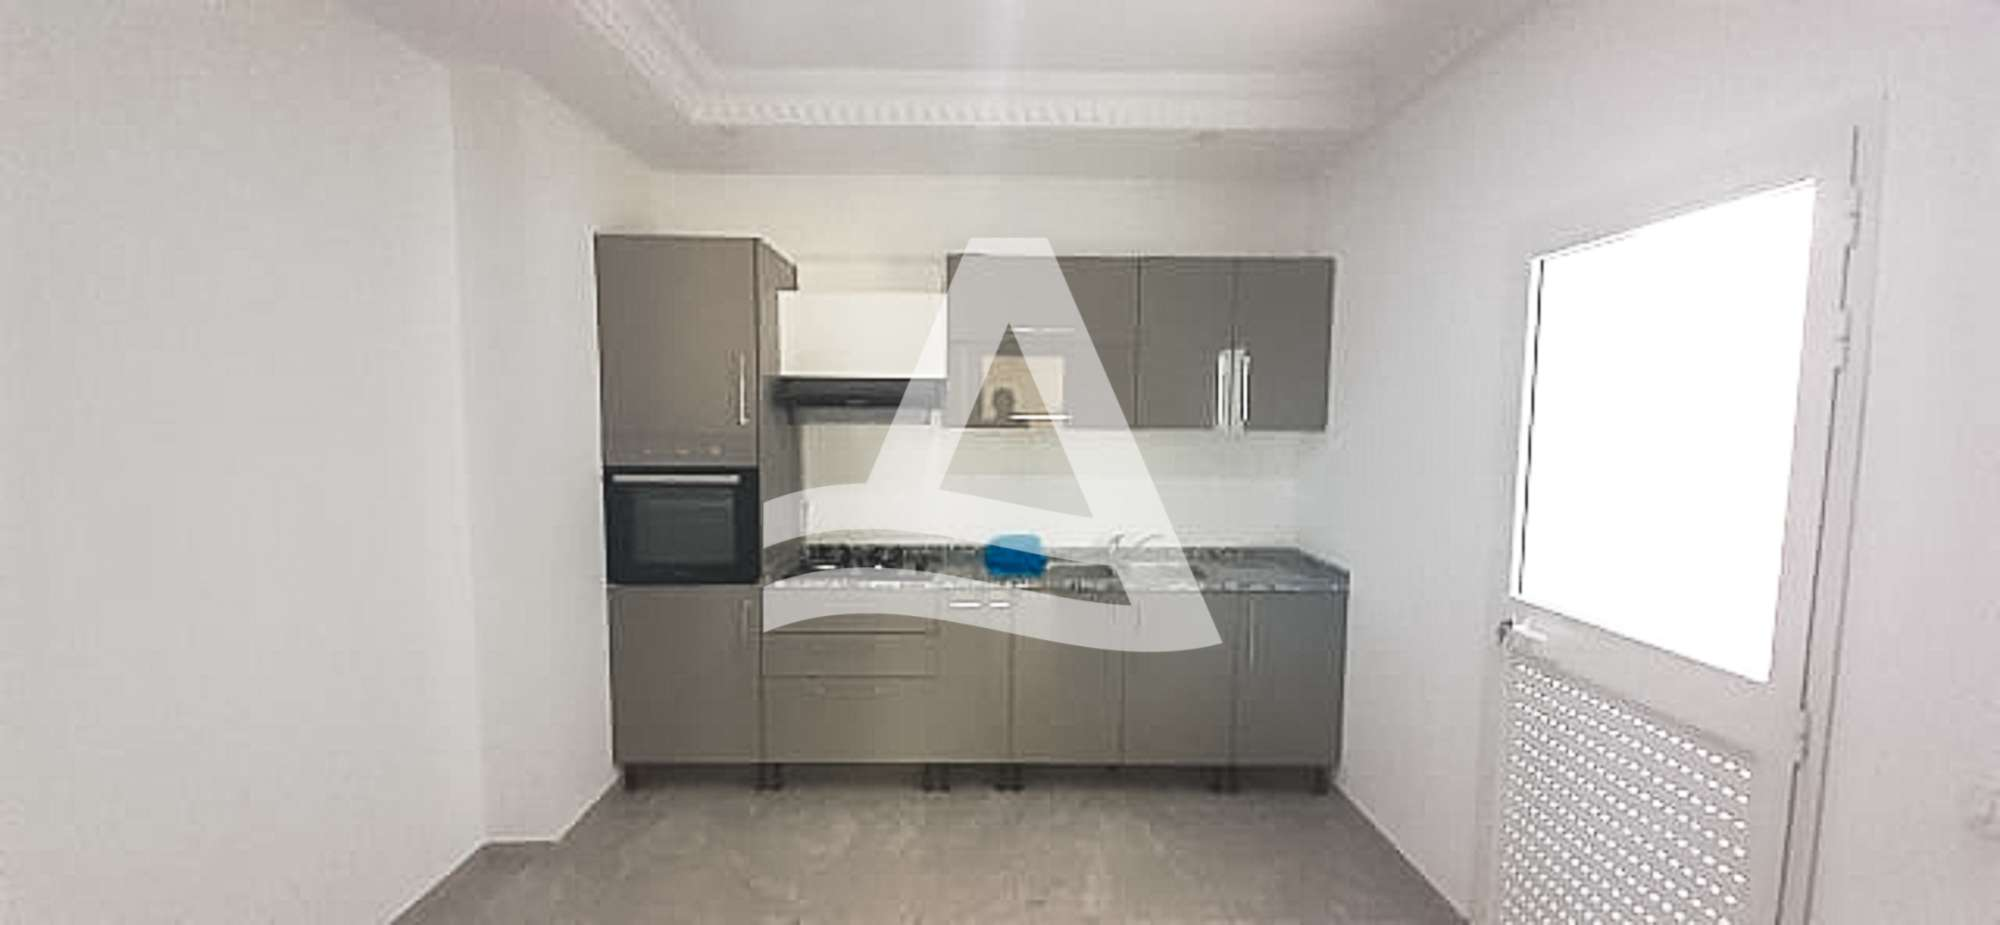 httpss3.amazonaws.comlogimoaws_Arcane_immobilière_la_Marsa-_location_-_vente_la_marsa_7_sur_9_1574175648028